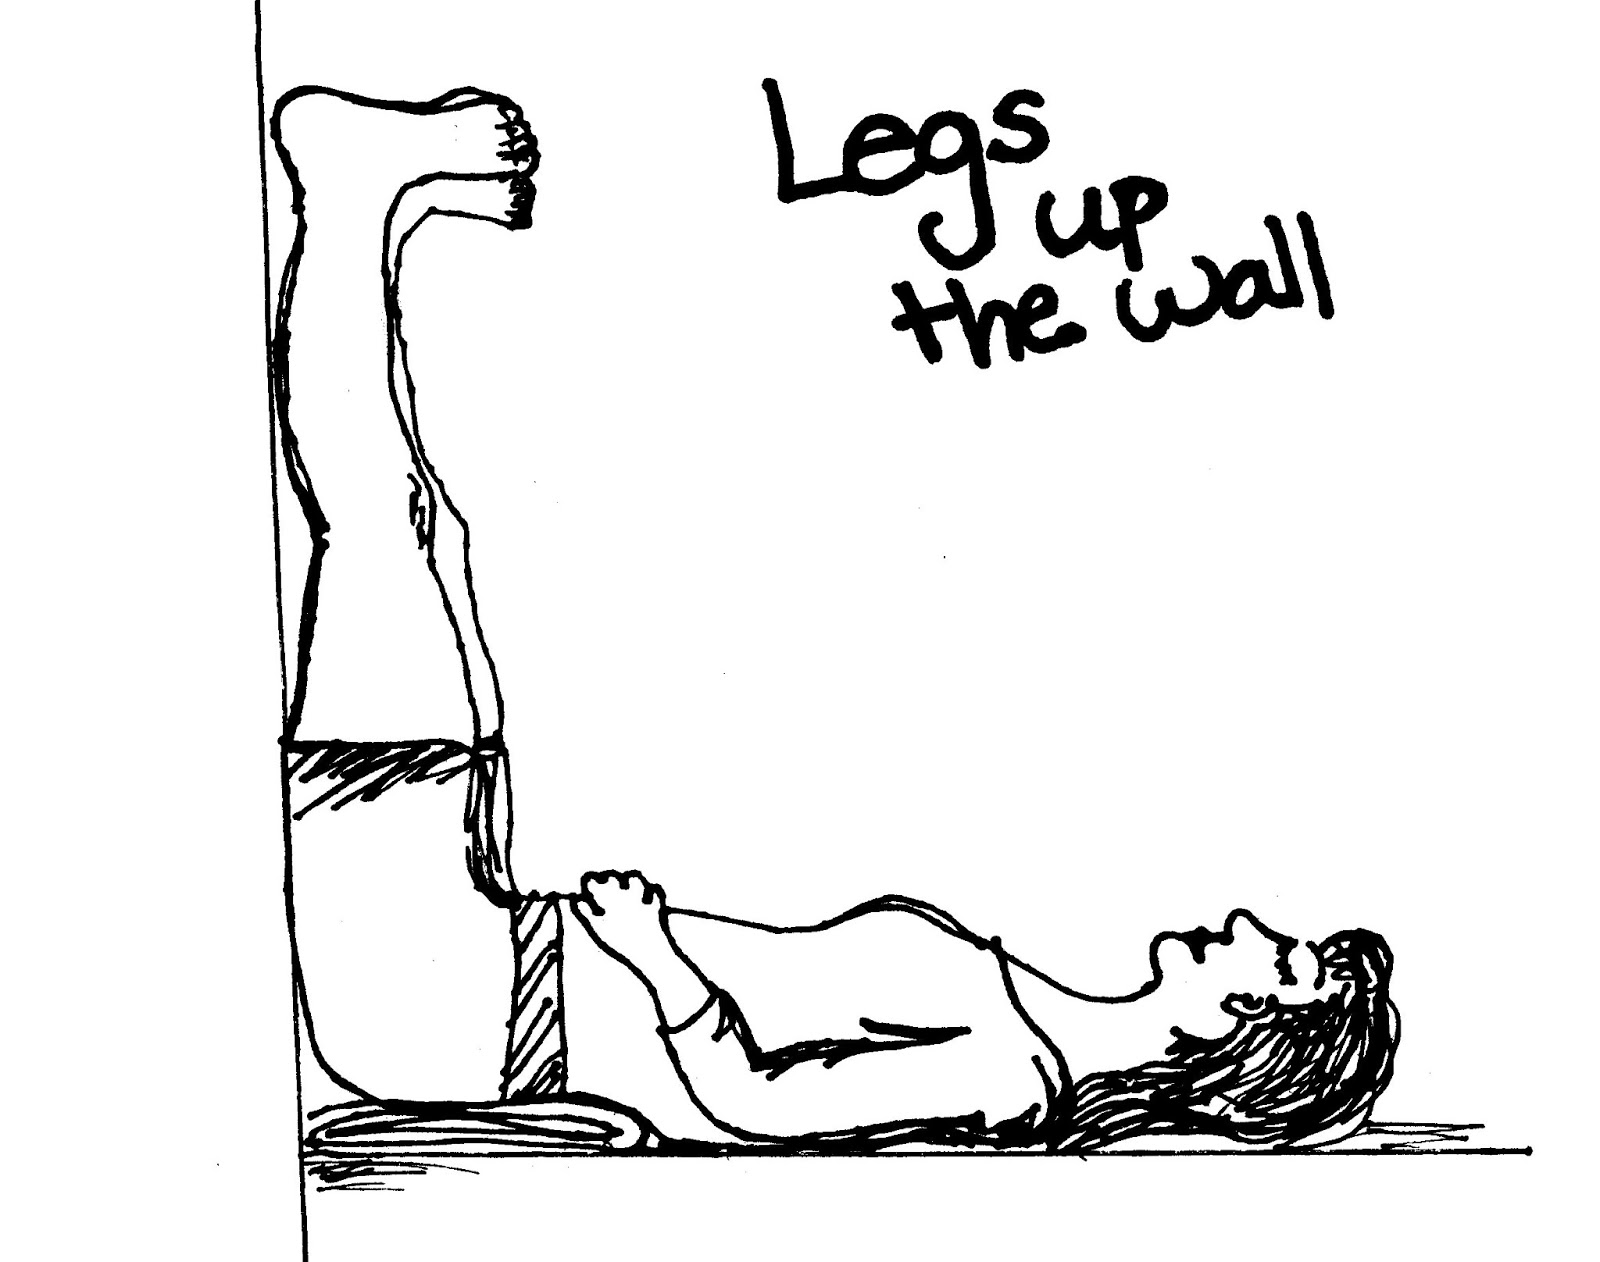 legsupthewall Anal Orgasm by ~pacha urbano on deviantART